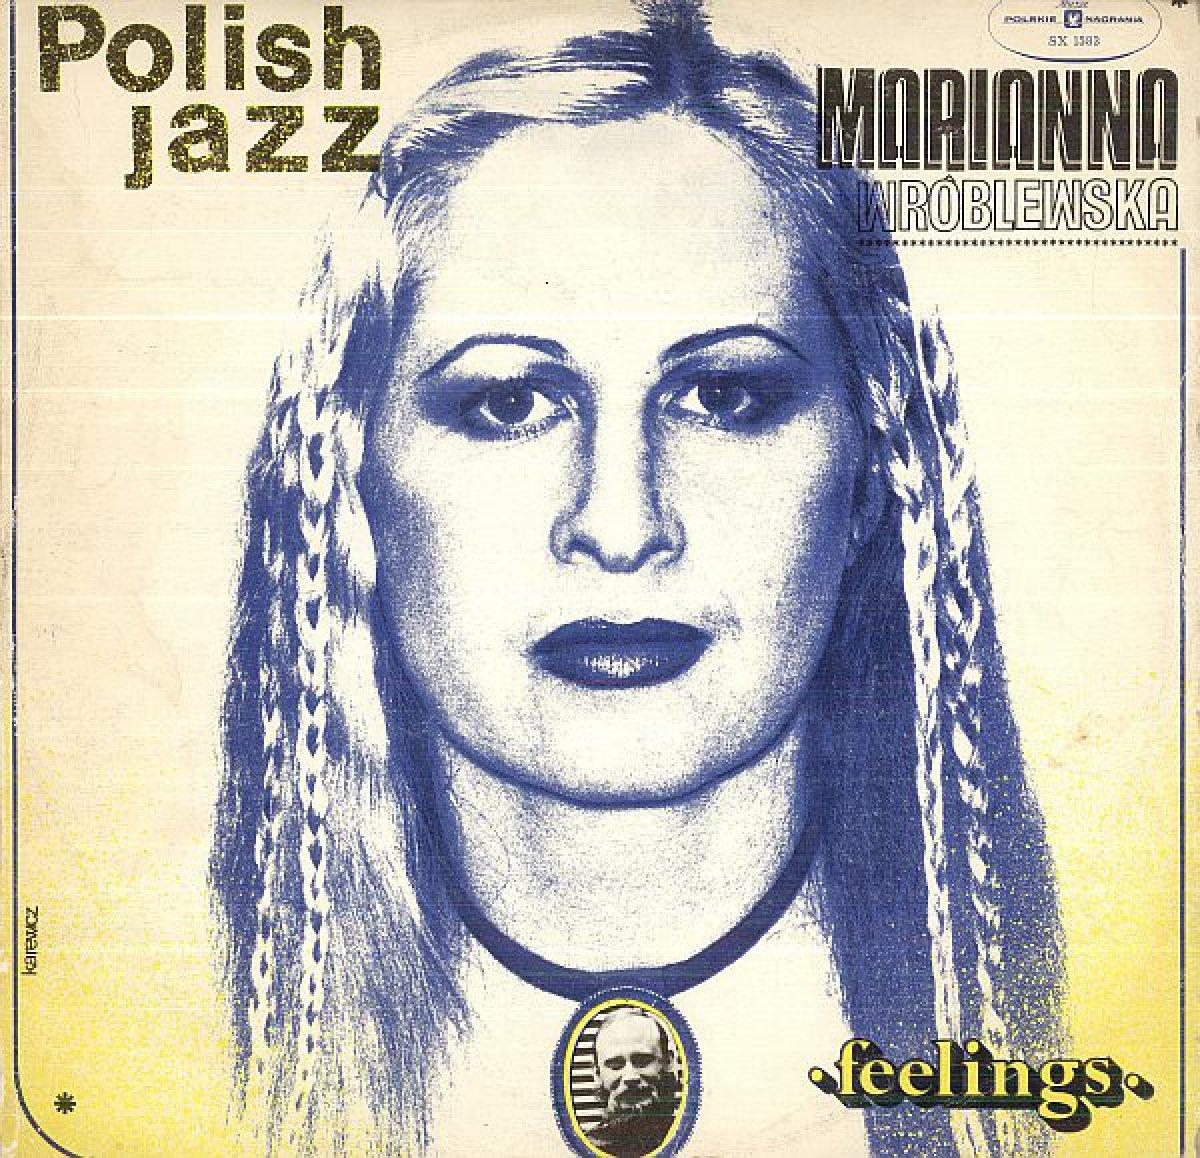 Marianna Wróblewska – Feelings (Polish Jazz – Vol. 53)